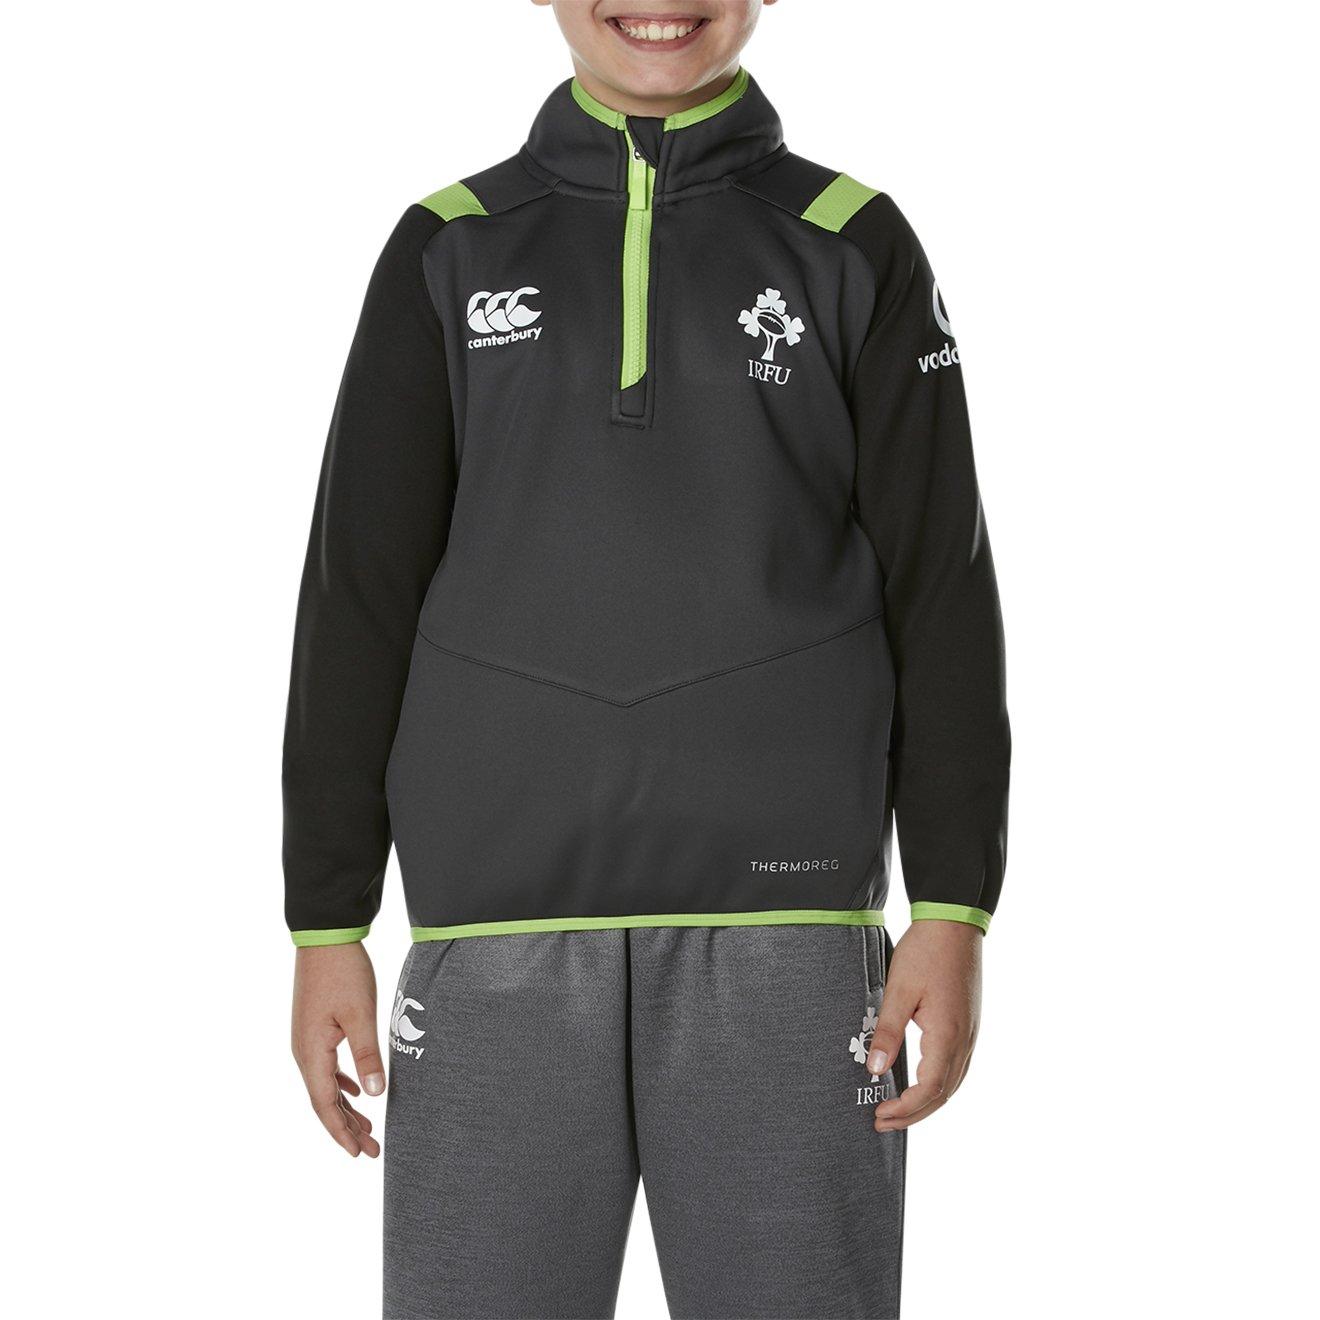 /Asphalt Canterbury Irlanda IRFU 2017//18/Bambini Thermoreg 1//4/Zip da Allenamento da Rugby/